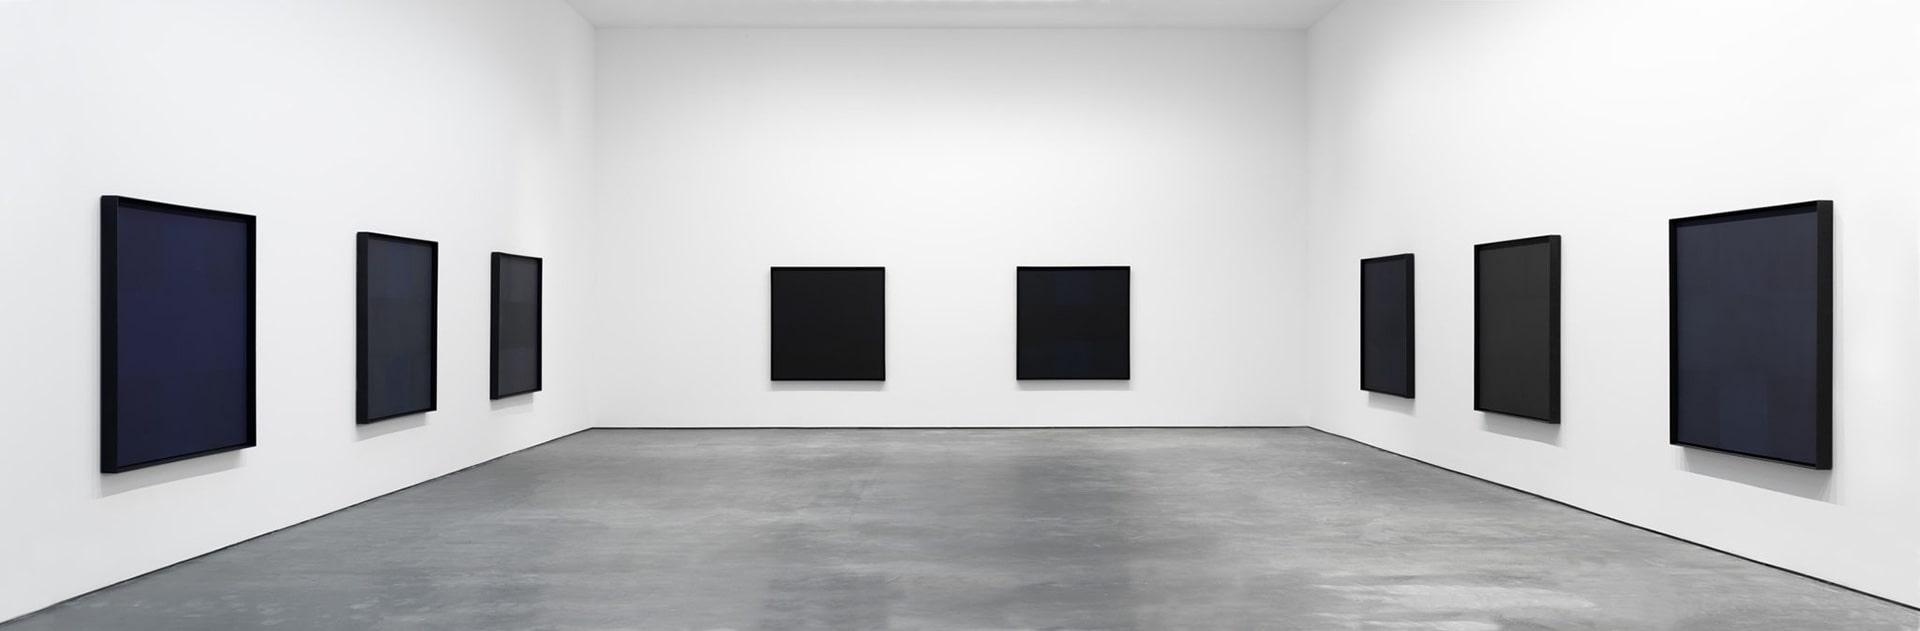 Una esposizione dei Black Paintings di Ad Reinhradt